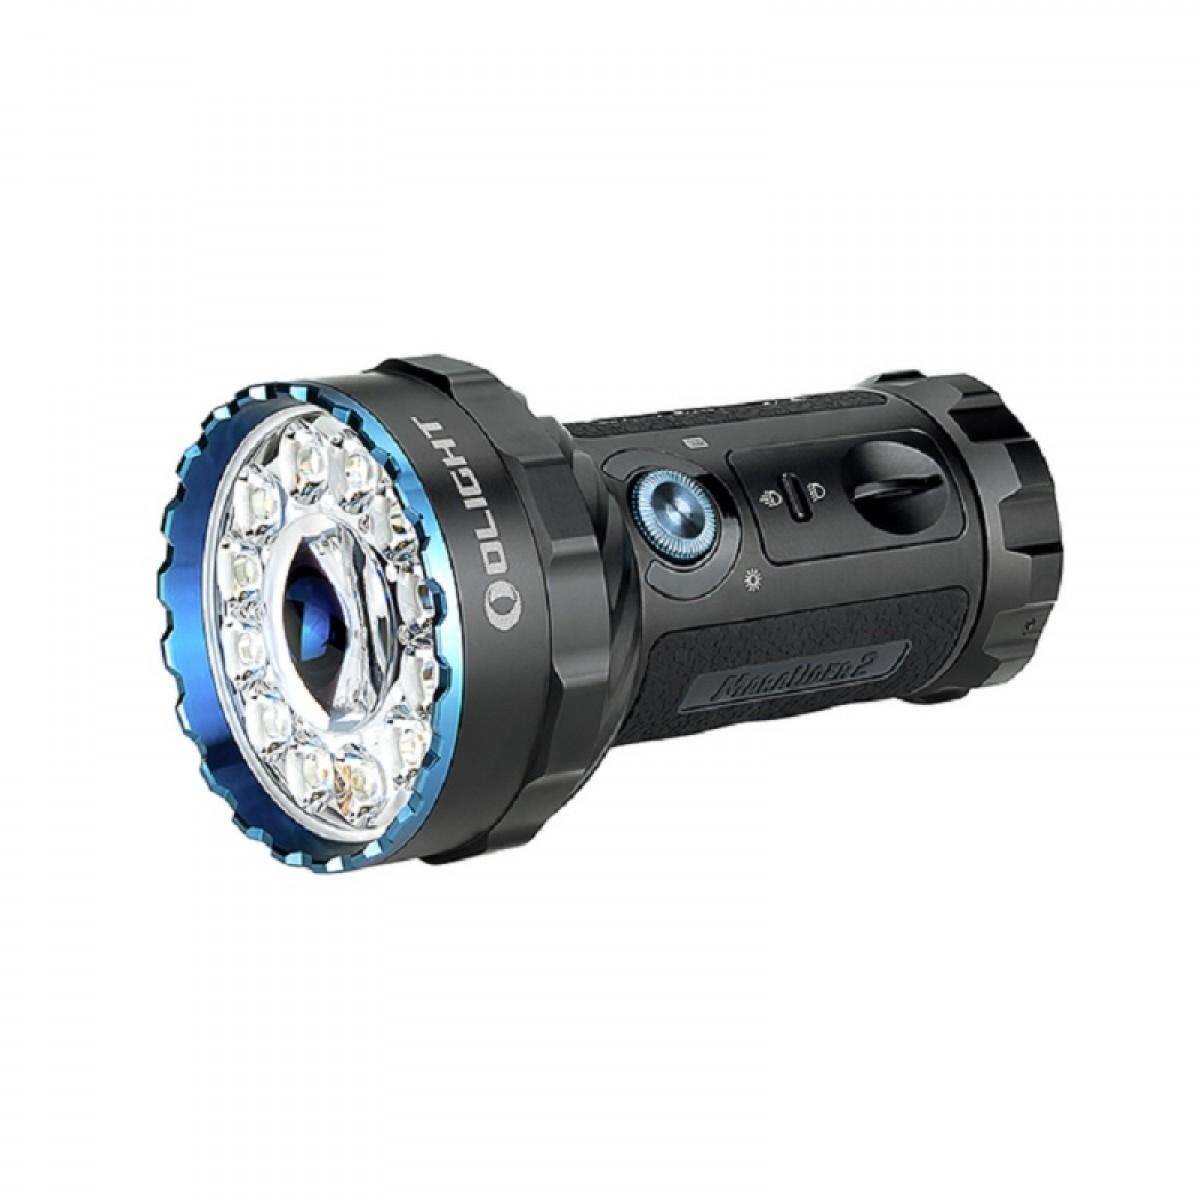 Olight Marauder 2 OSRAM KW CULPM1.TG 14000L Rechargeable SearchLight Flashlight